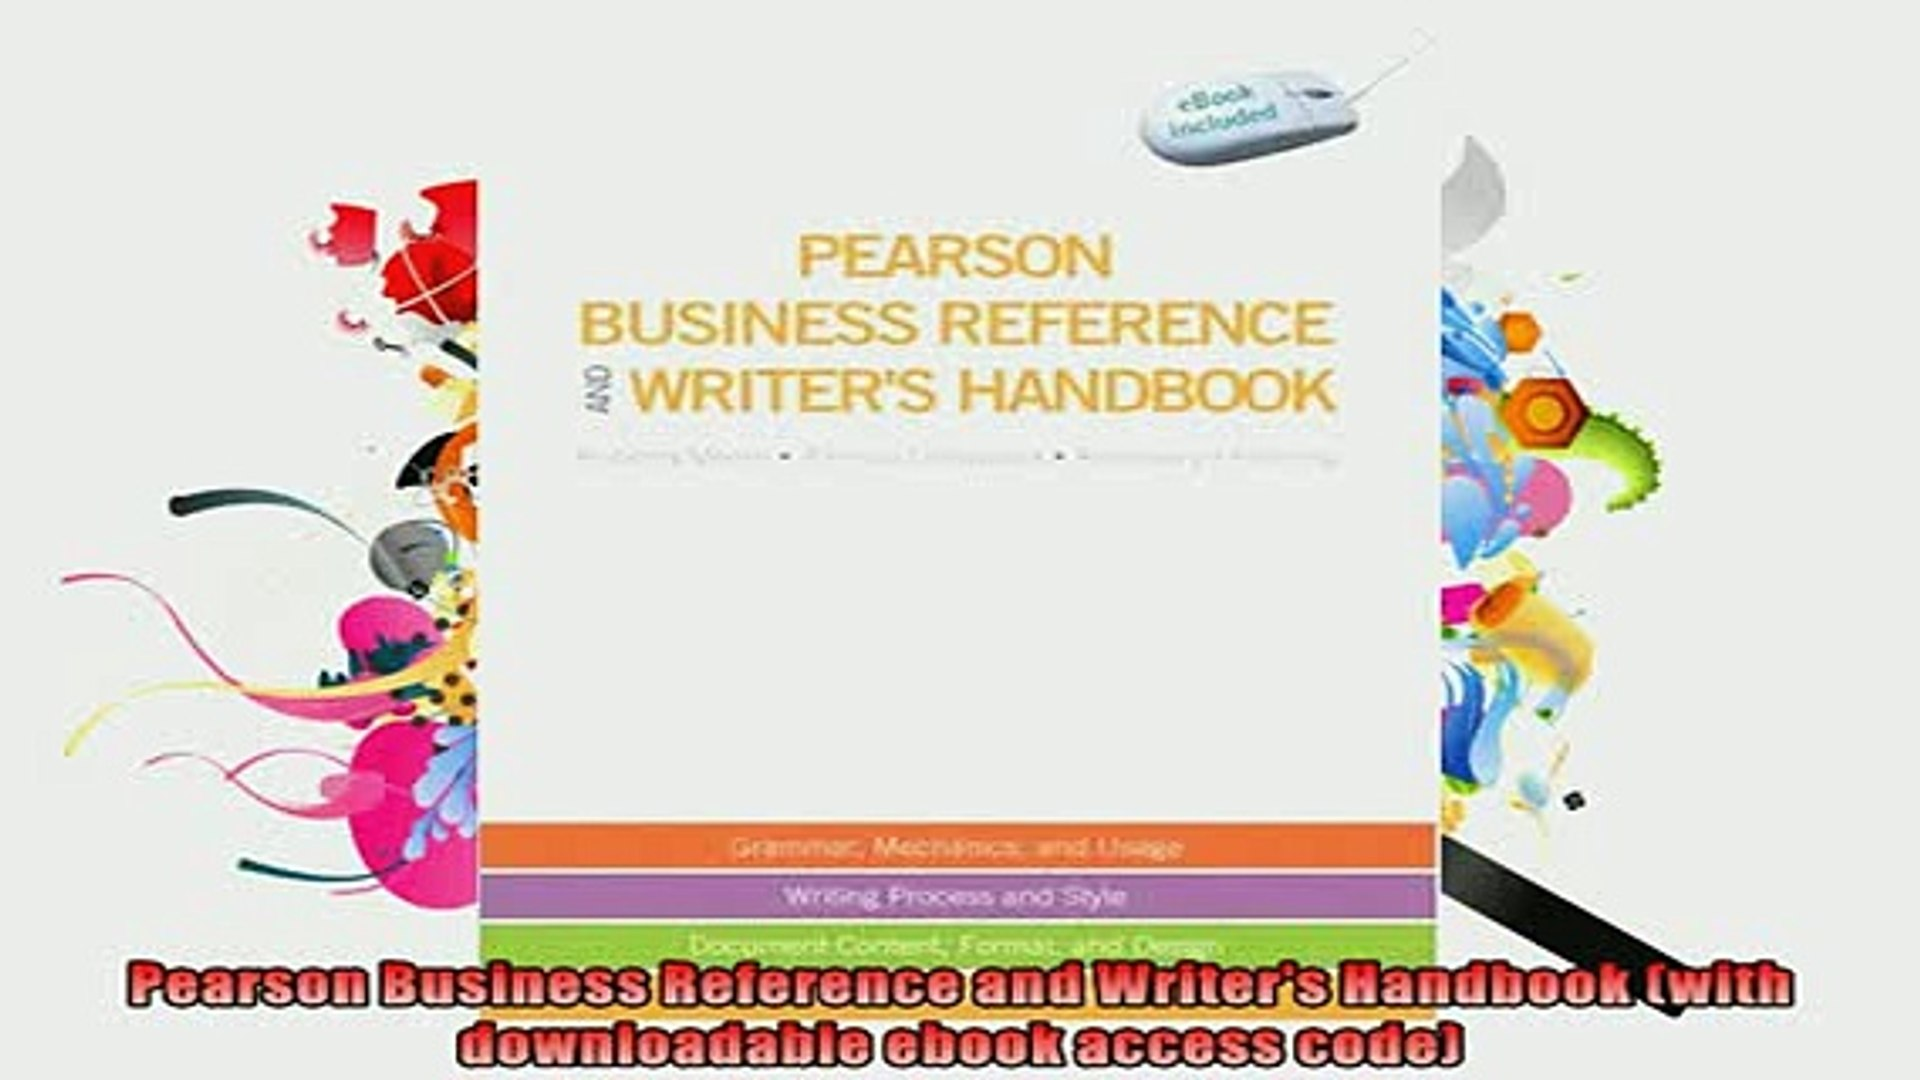 downloadable ebook